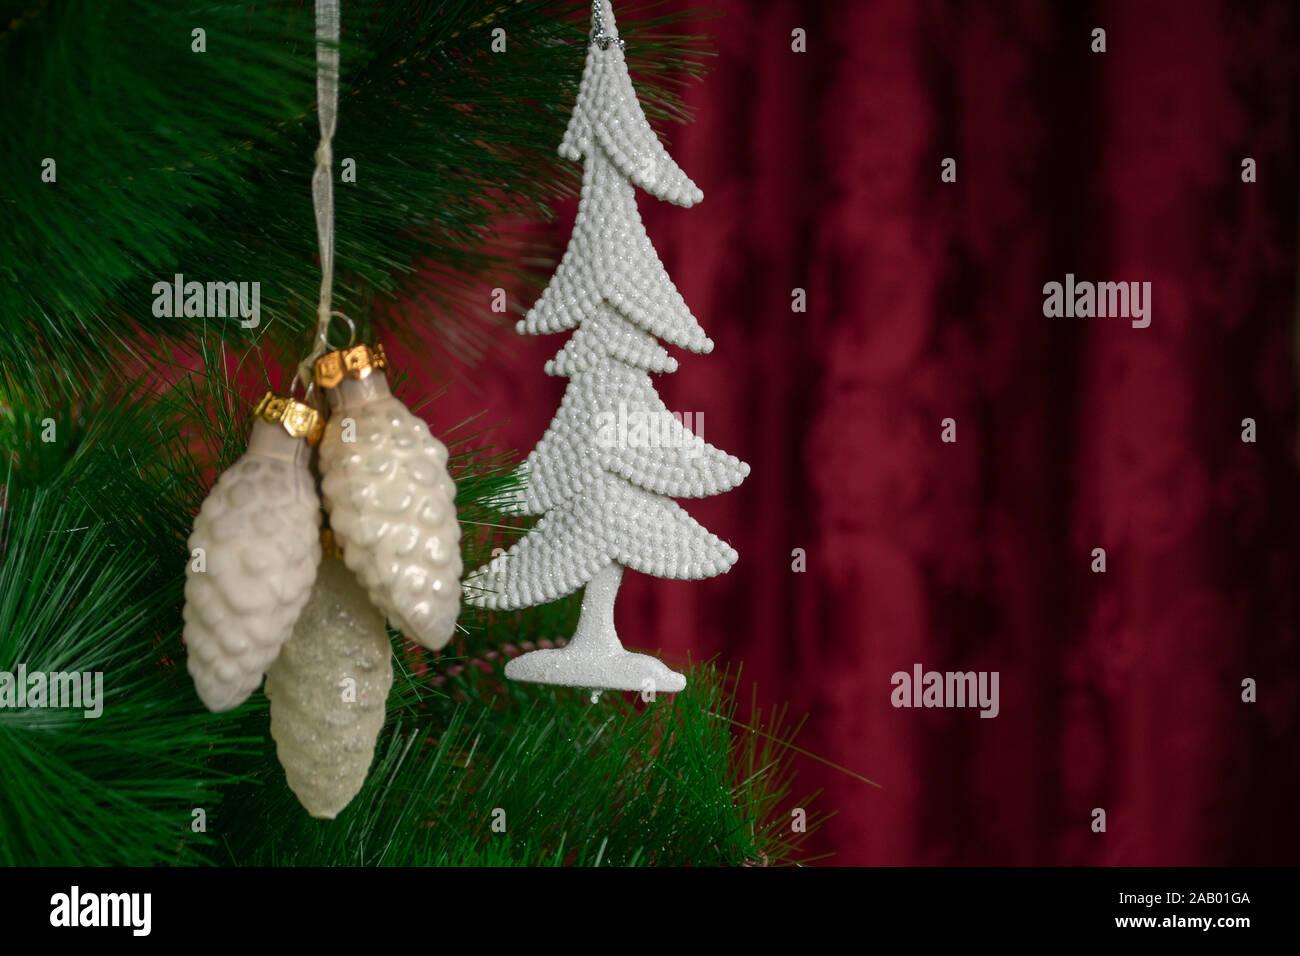 Weißkiefer 30 graines pinus sylvestris sylvestre rotföhre FORCHE blanc pin